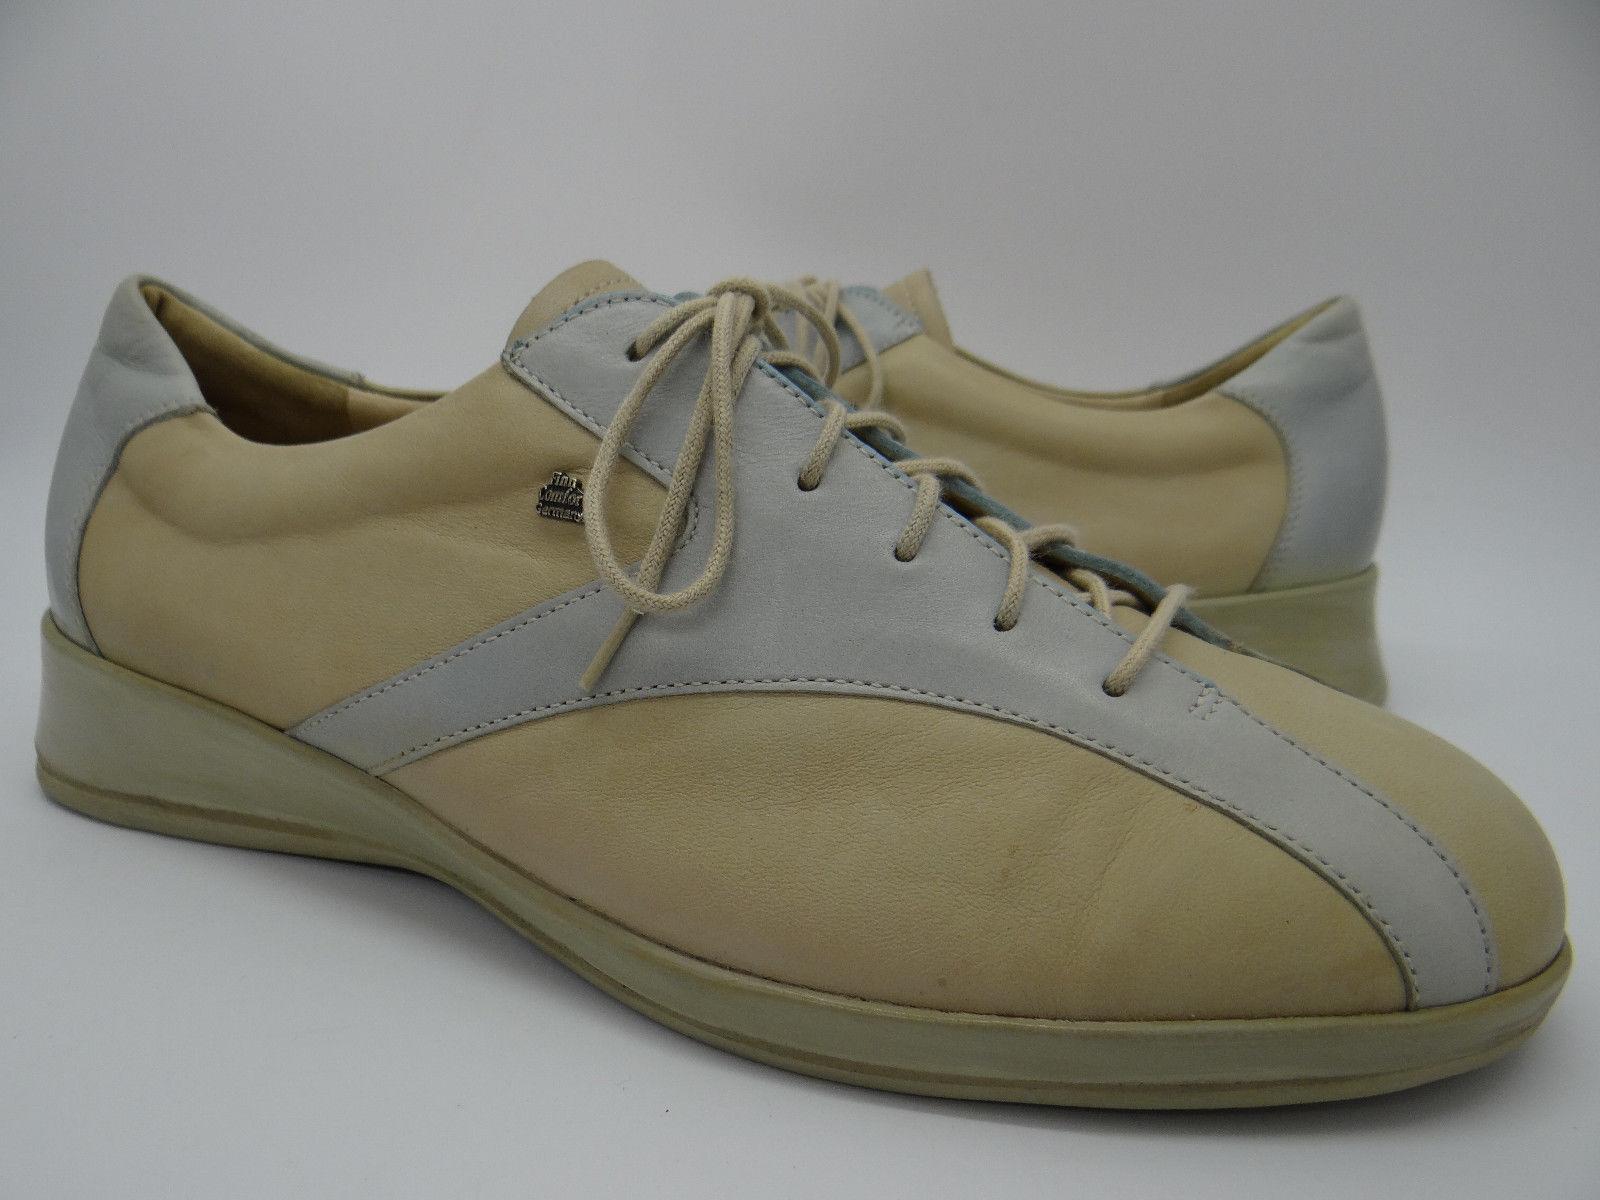 FINN COMFORT 10 1/2  US (8 UK), 'BIERUT' womens leather, S-W-16